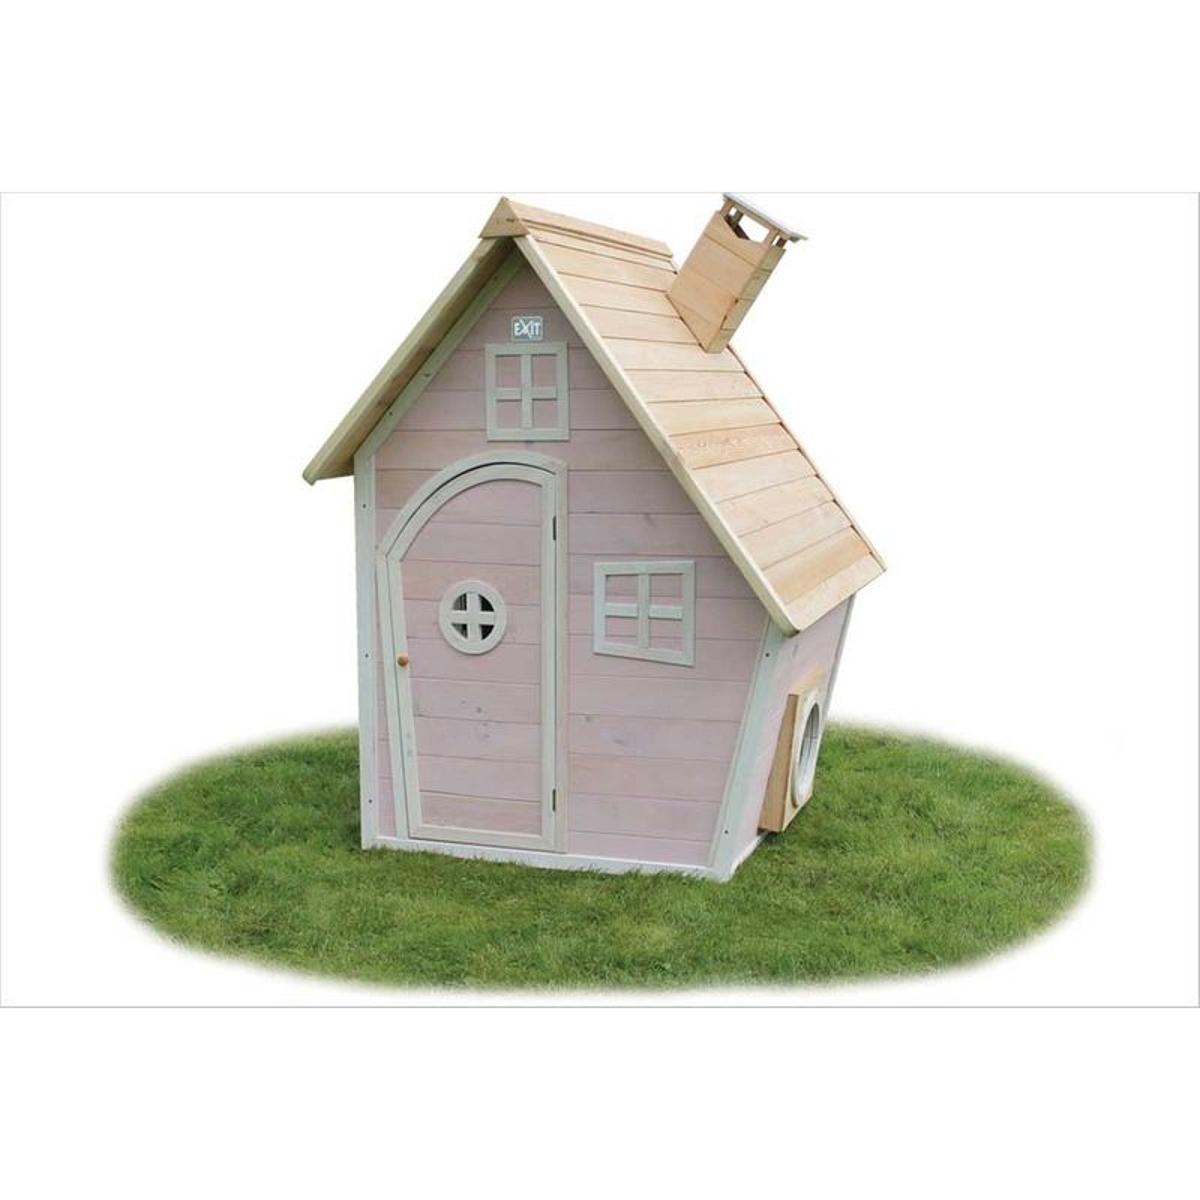 Petite cabane en bois rose Fantasia 100